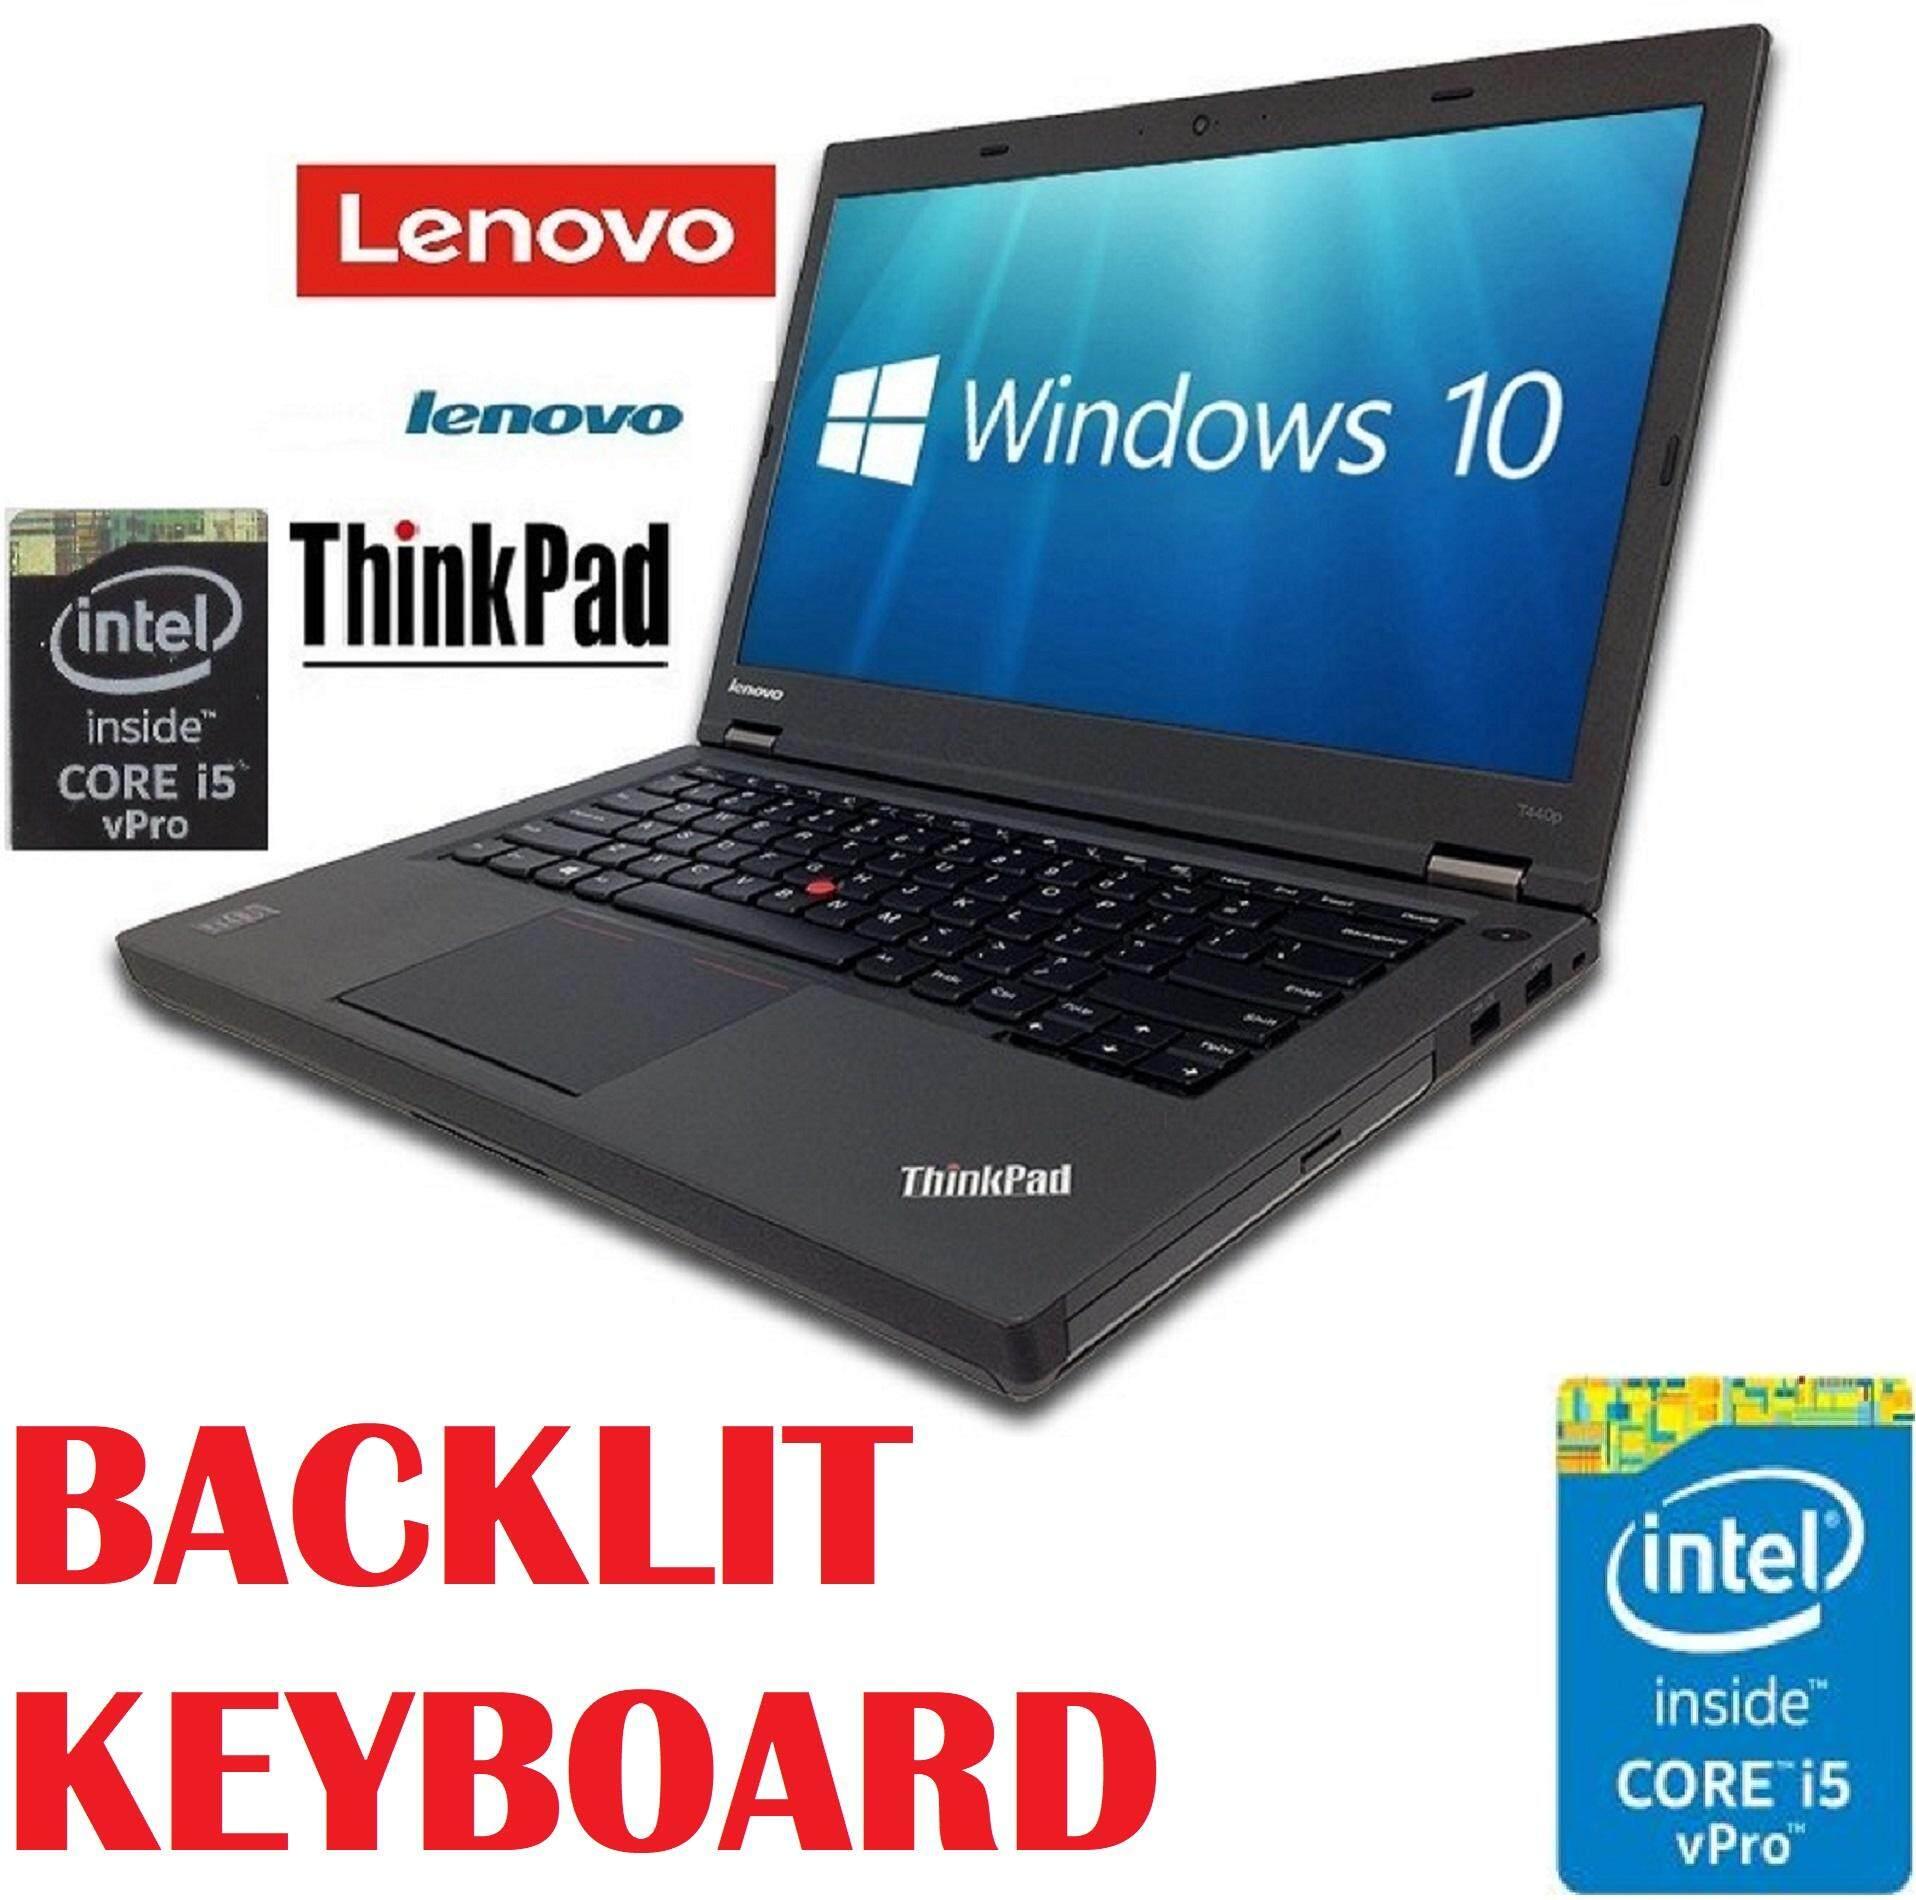 (REFURBISHED)Lenovo ThinkPad T440P Intel core i5 4300M Vpro Processor/4GB  DDR3/500GB HDD/INTEL HD GRAPHIC/14